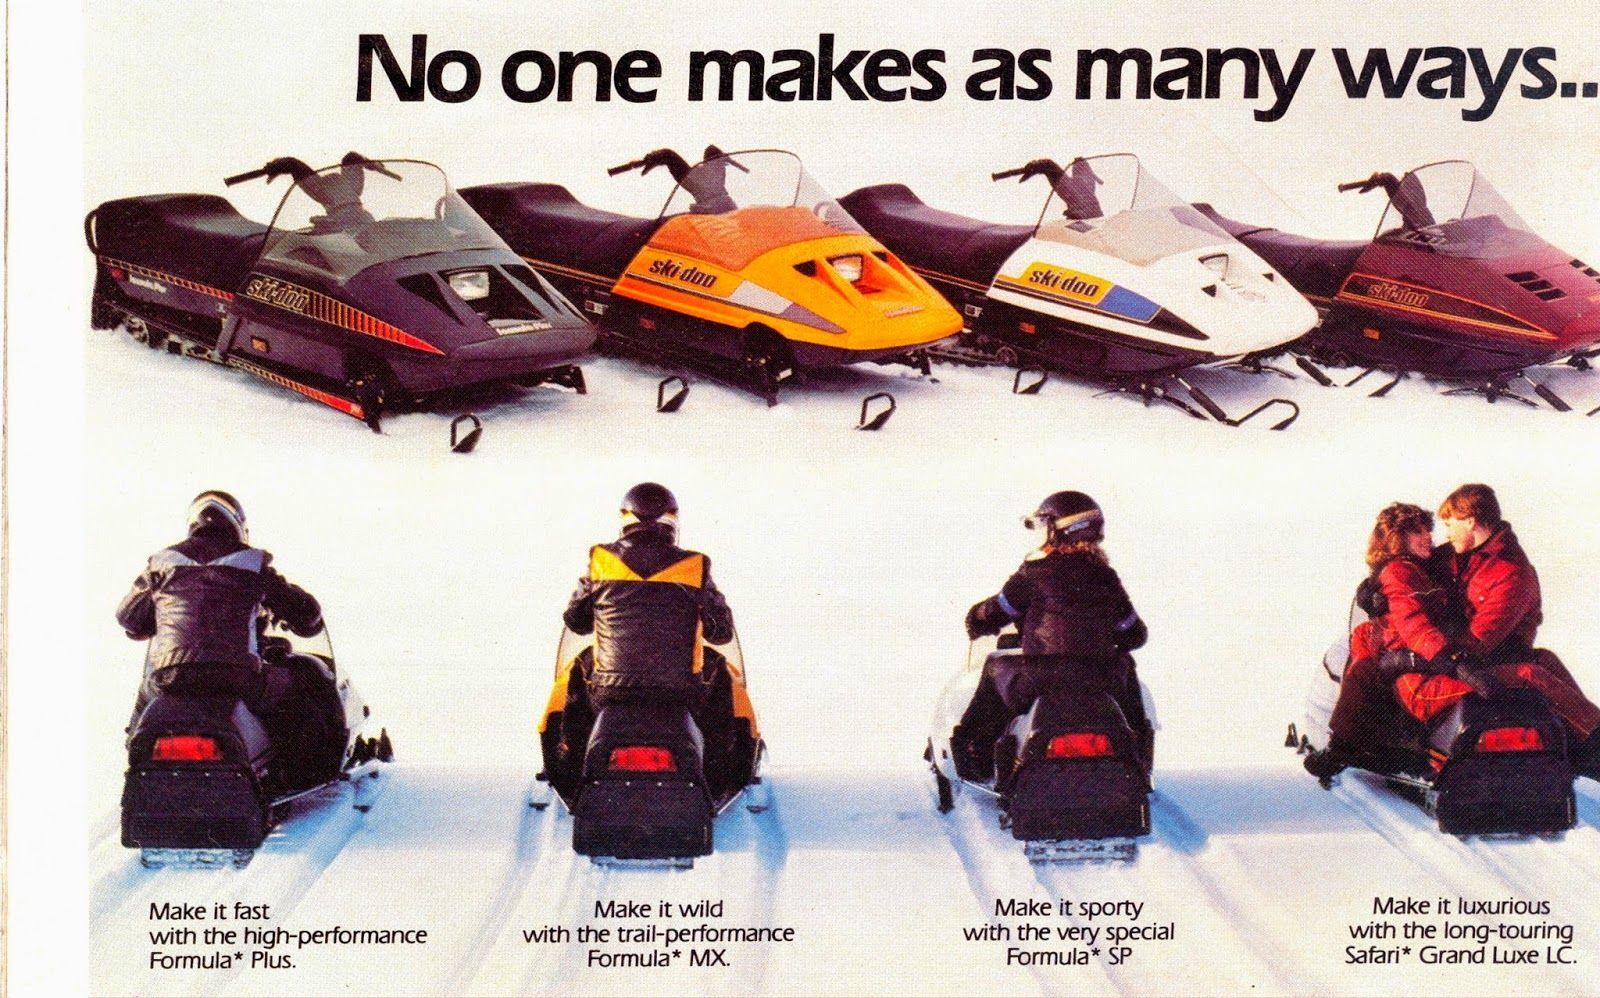 The 1986 Ski Doo Line Up Vintage Sled Snowmobile Skiing